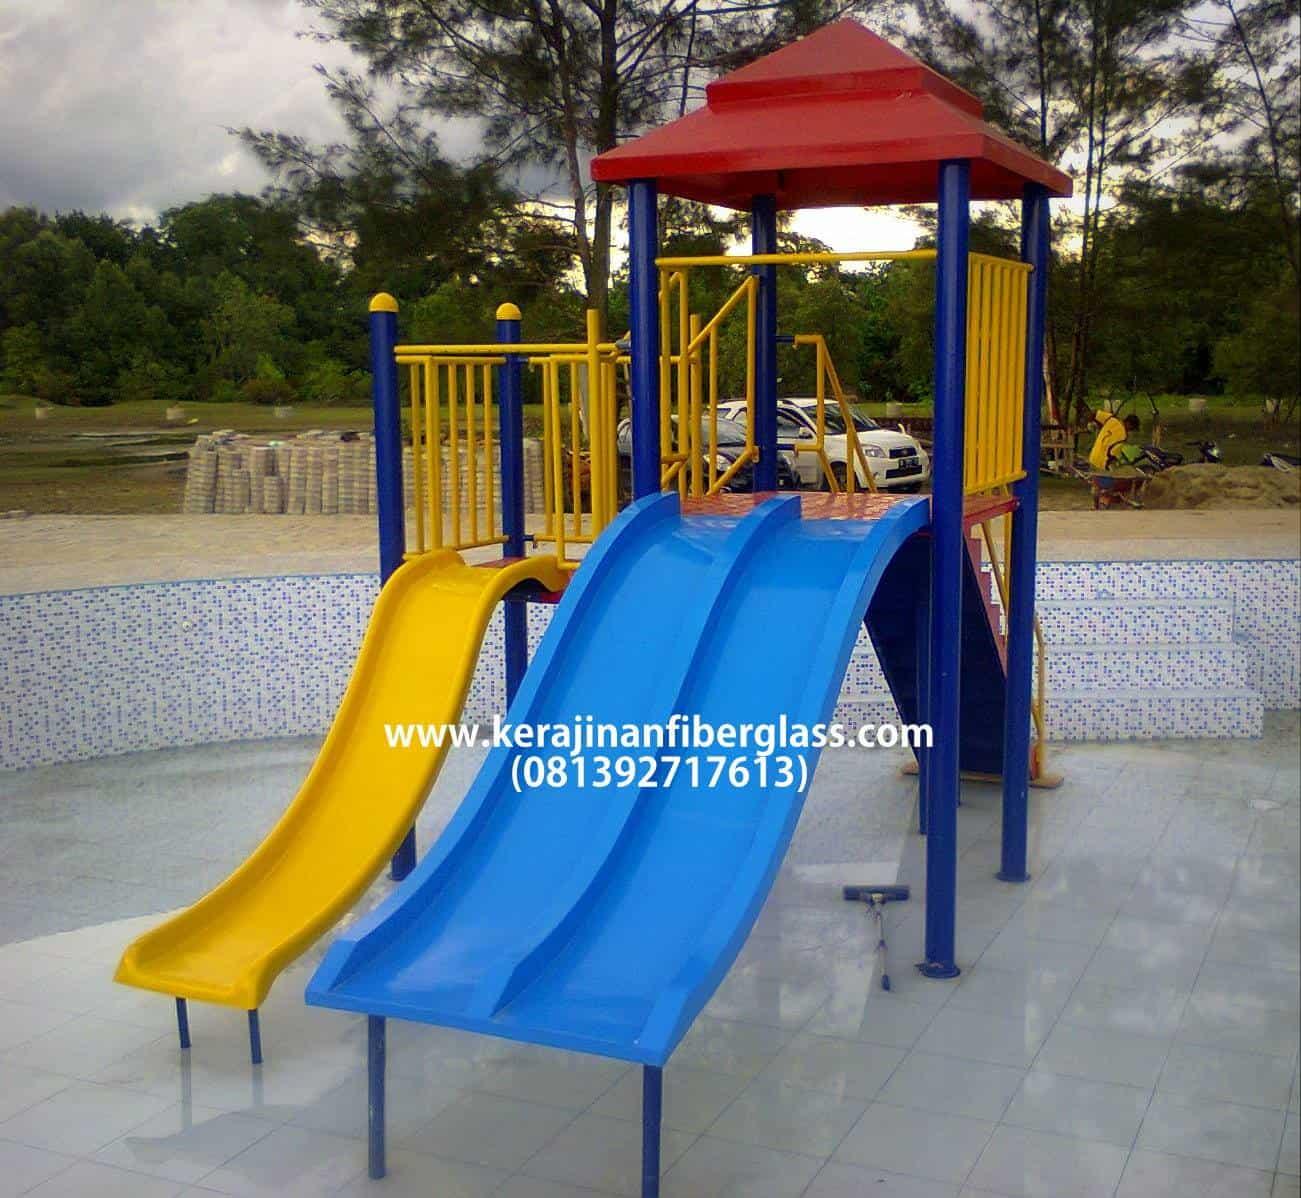 Outdoor Wedding Murah Di Bandung: Jual Playground Anak Indoor Outdoor Harga Murah Indonesia